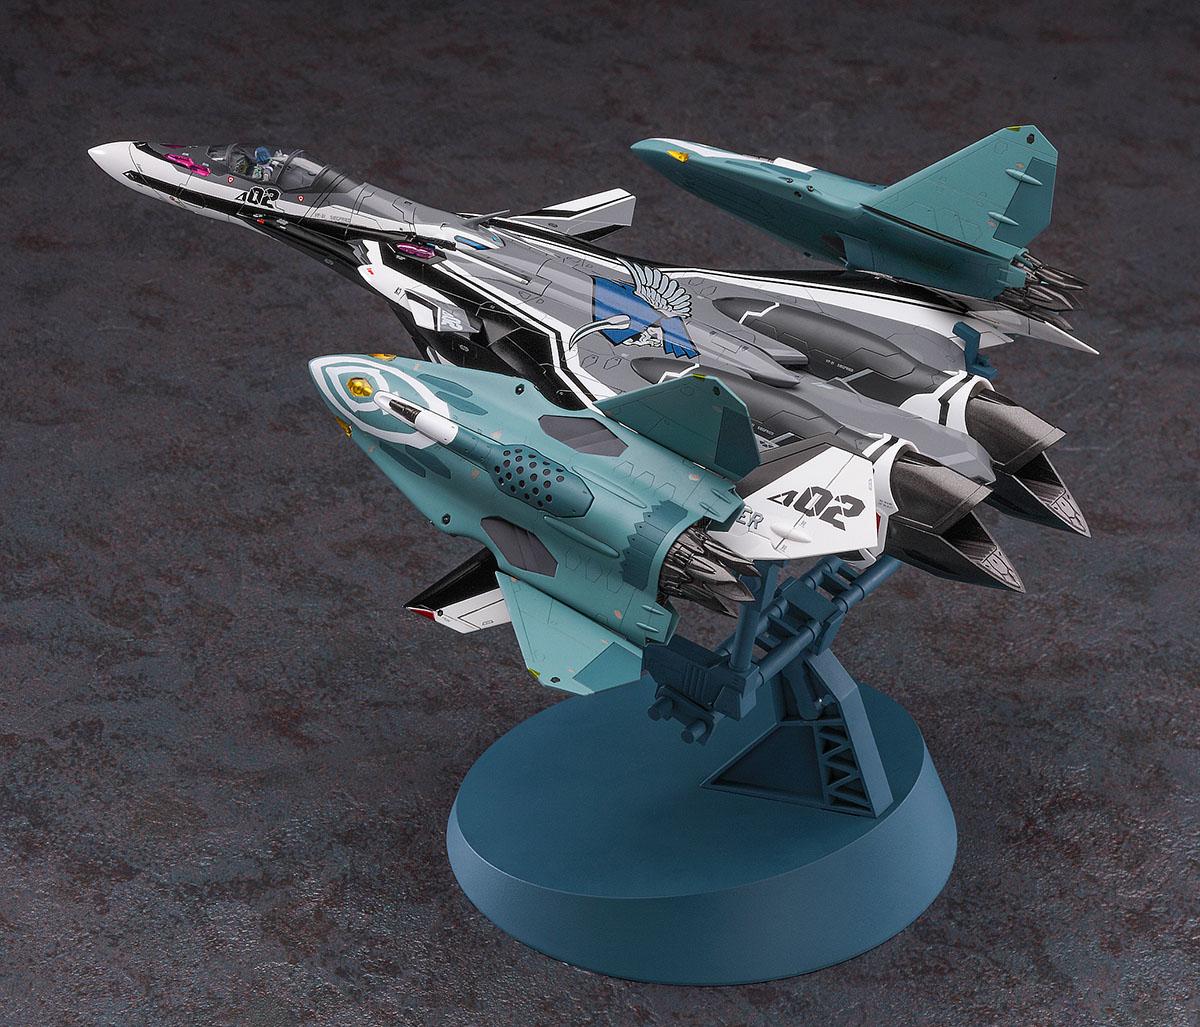 VF-31F-2.jpg.e6fcca77d0b8fb49bc9bfc3ae0e3648f.jpg